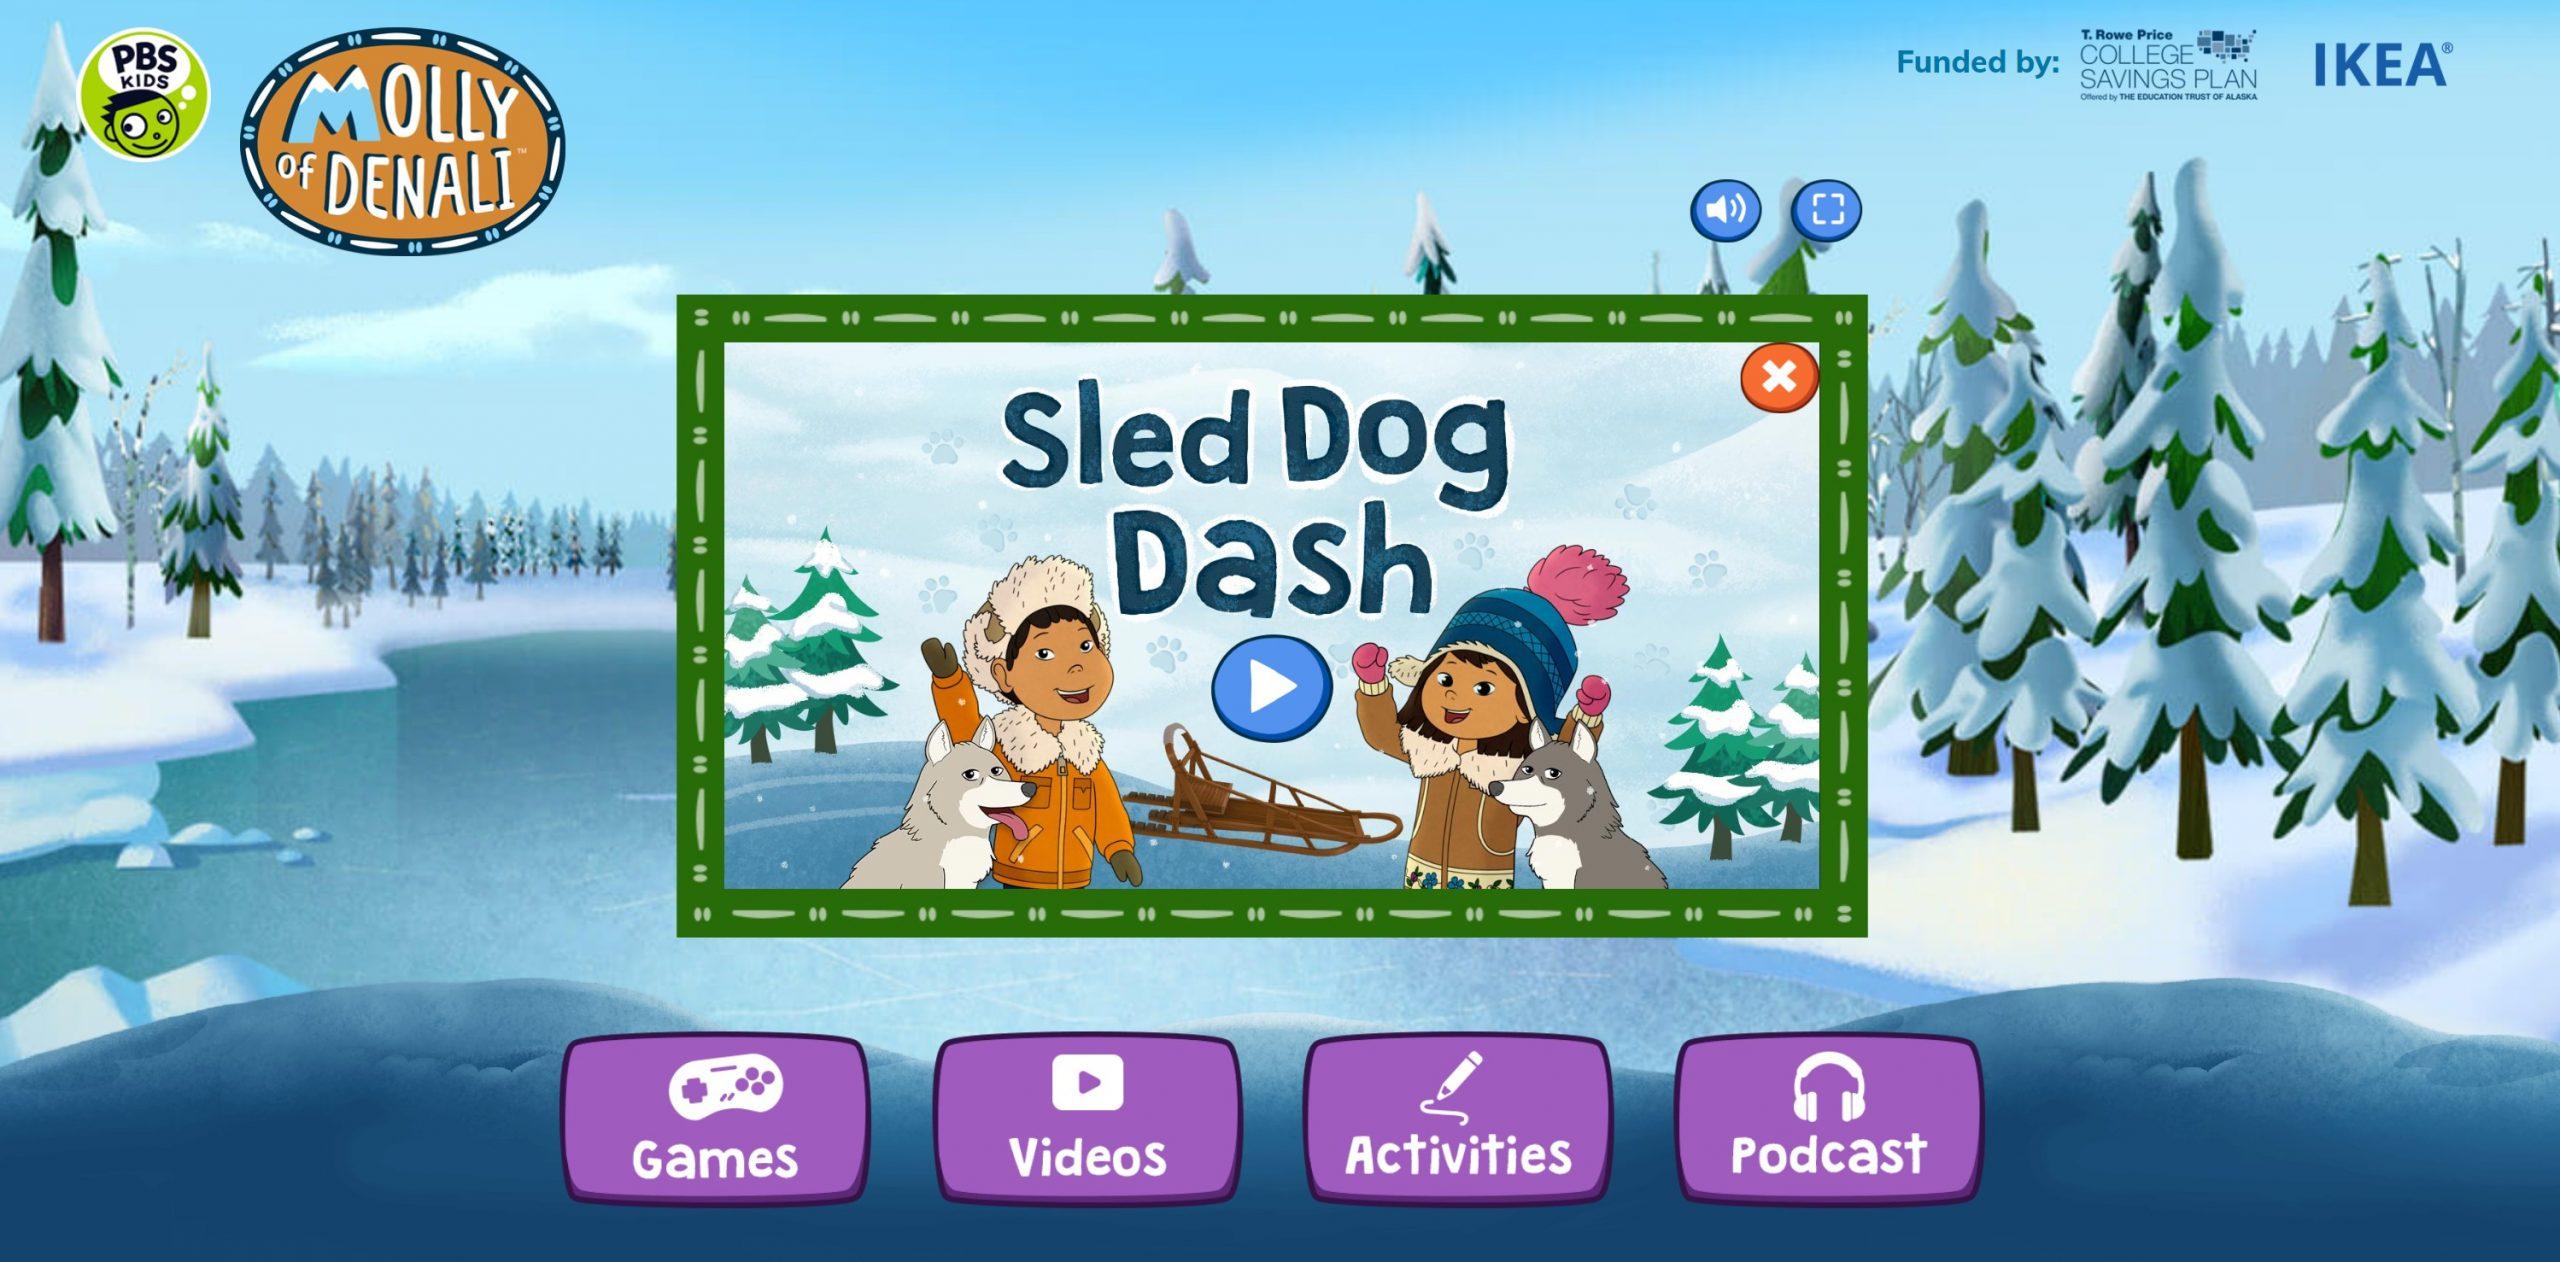 sled dog dash game